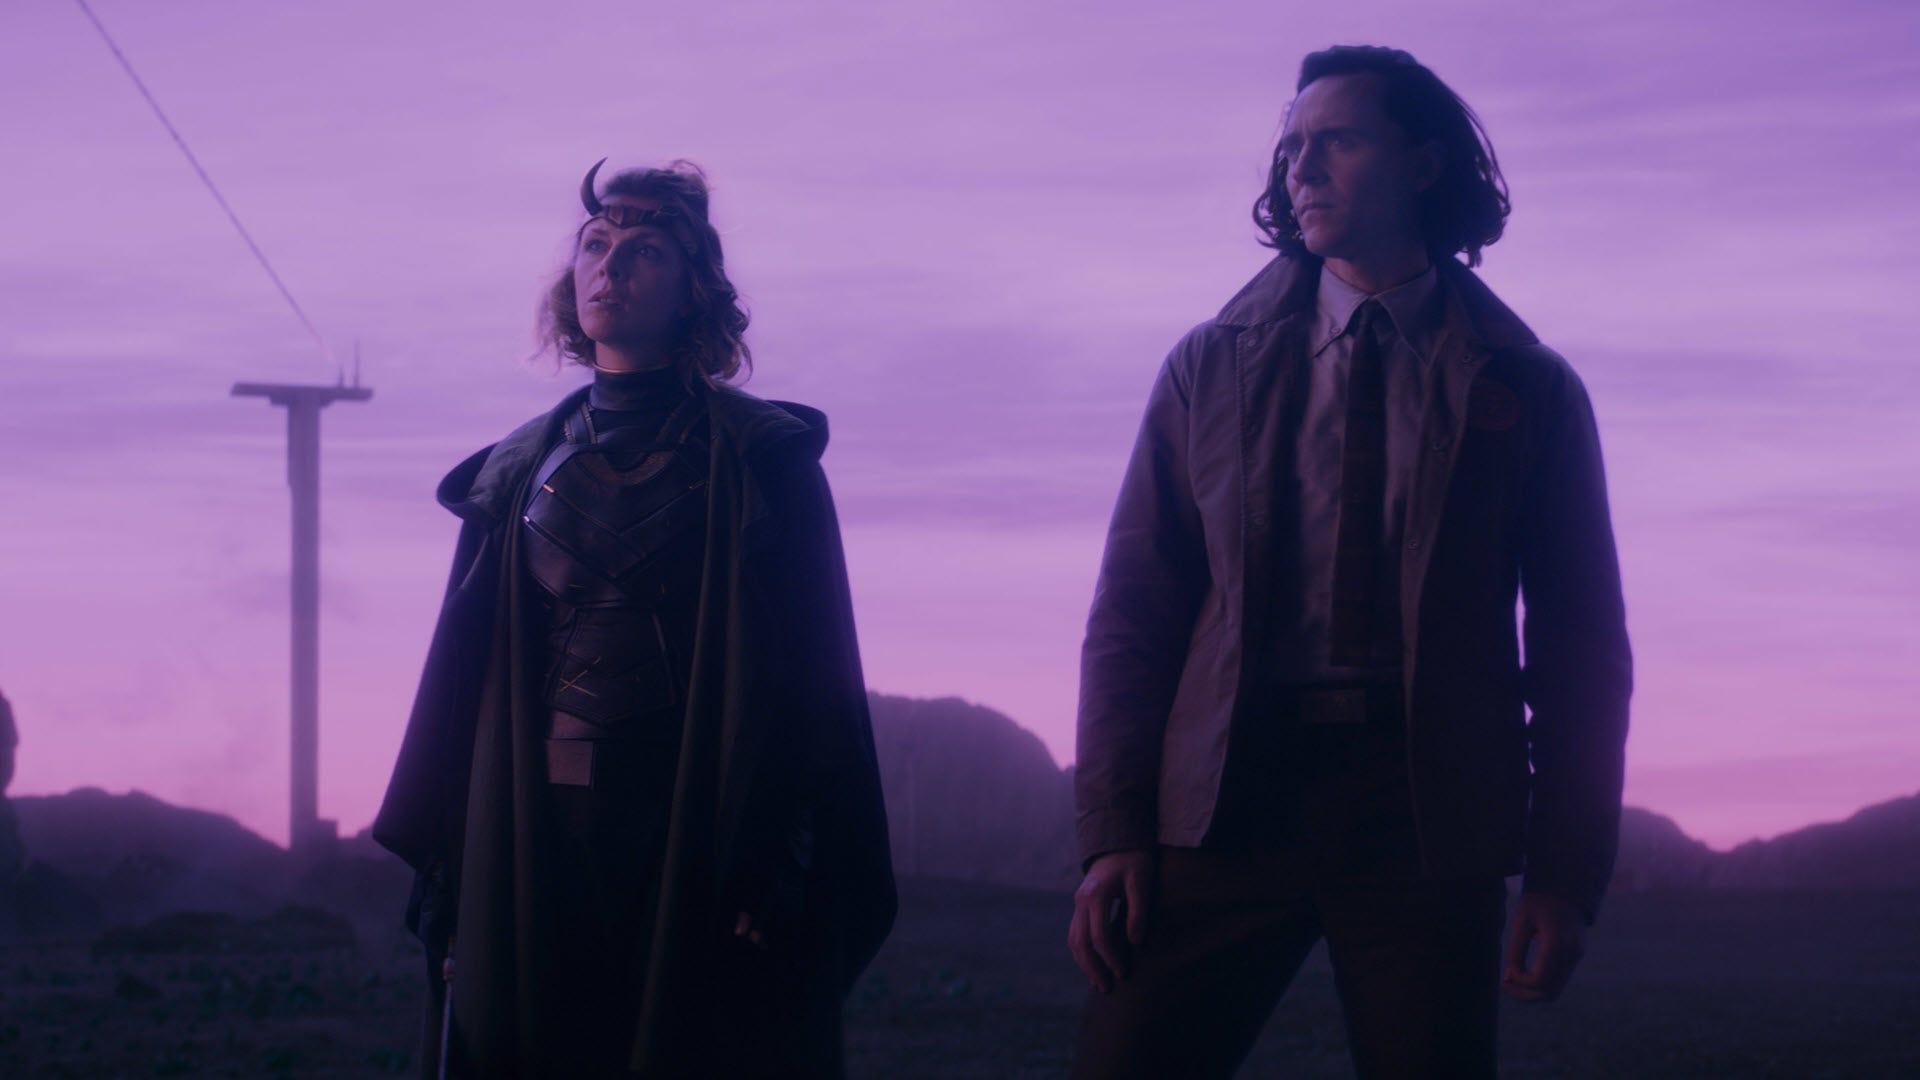 Loki and Sylvie on an alien planet